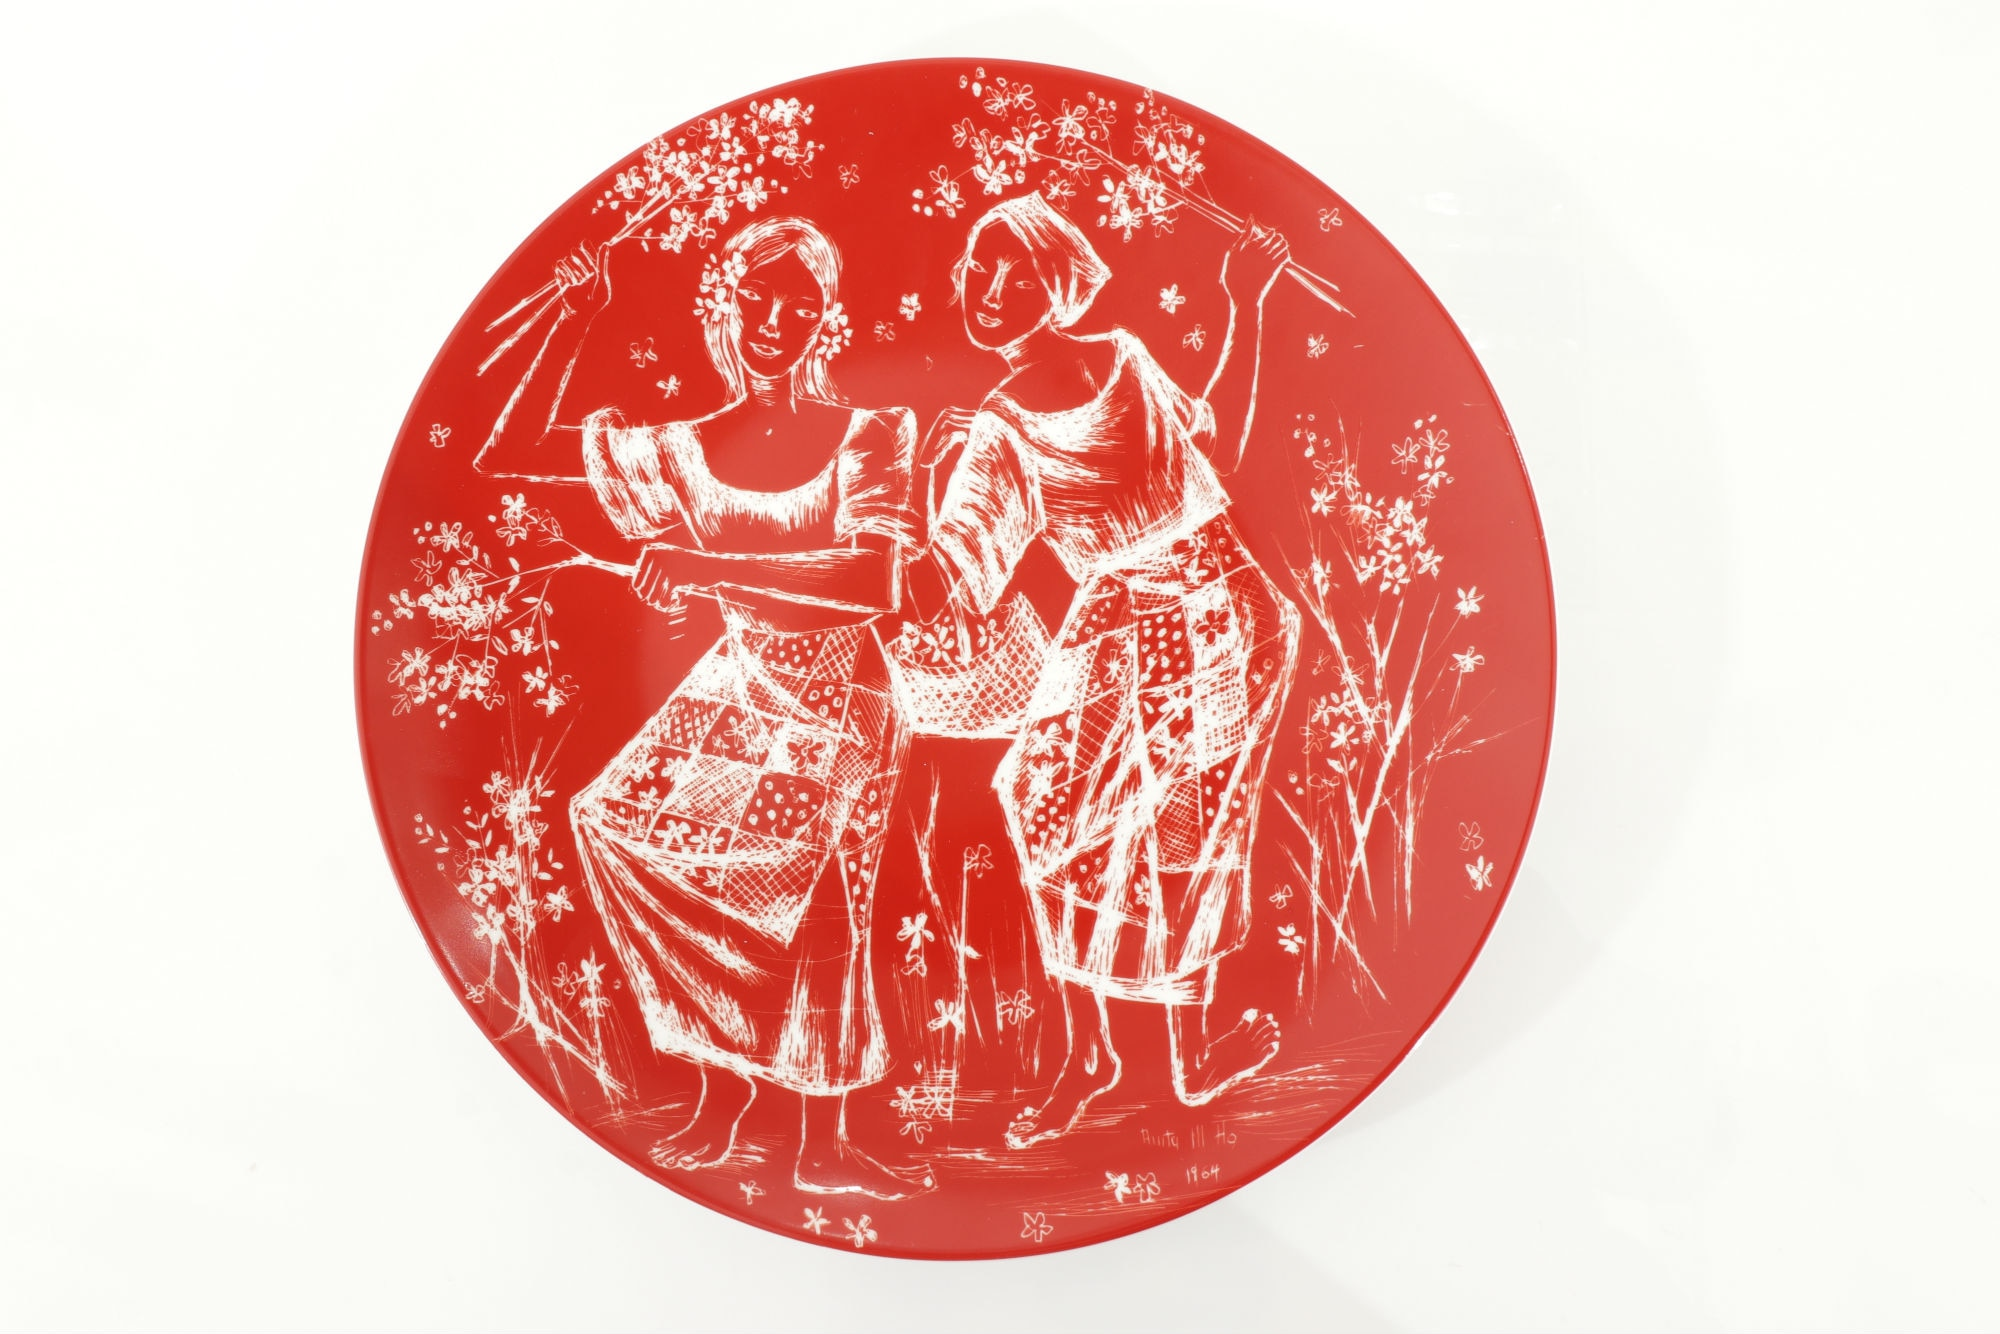 Anita Magsaysay-Ho's Kakawati Dance is adapted by Rustan's on a Bernardaud plate